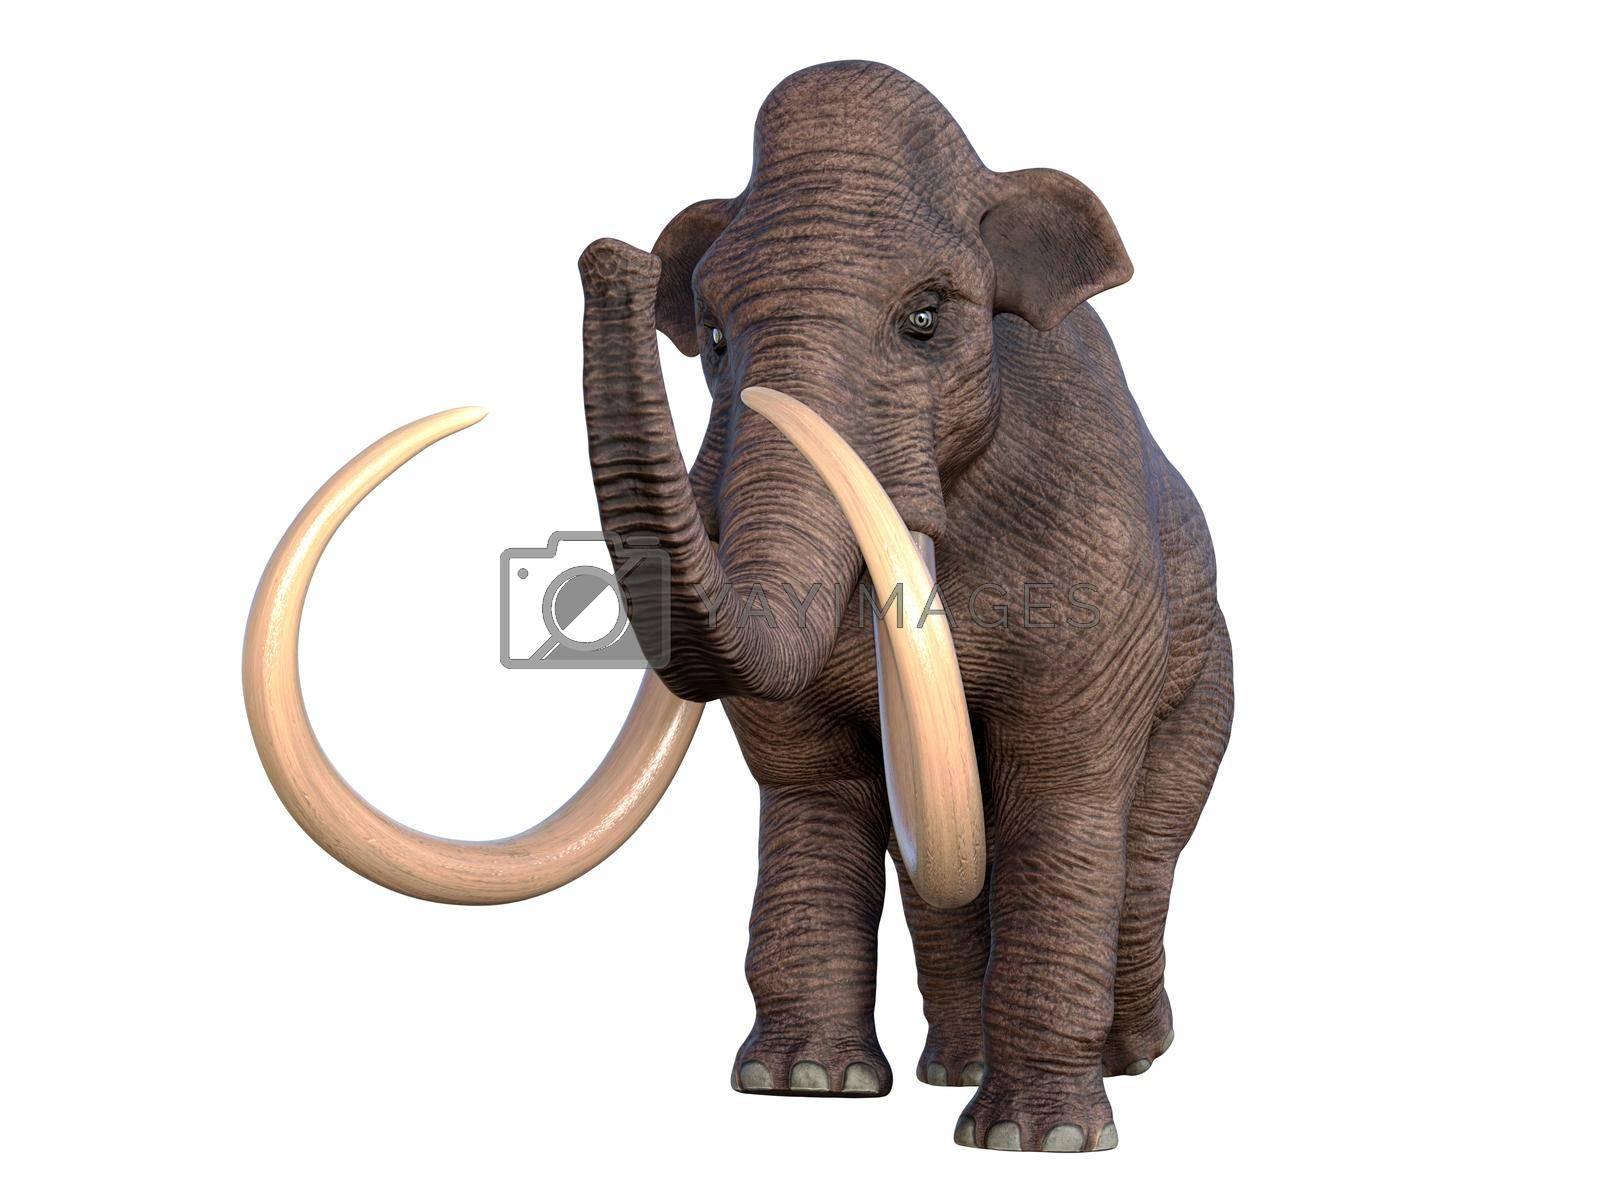 Royalty free image of Columbian Mammoth Walking by Catmando